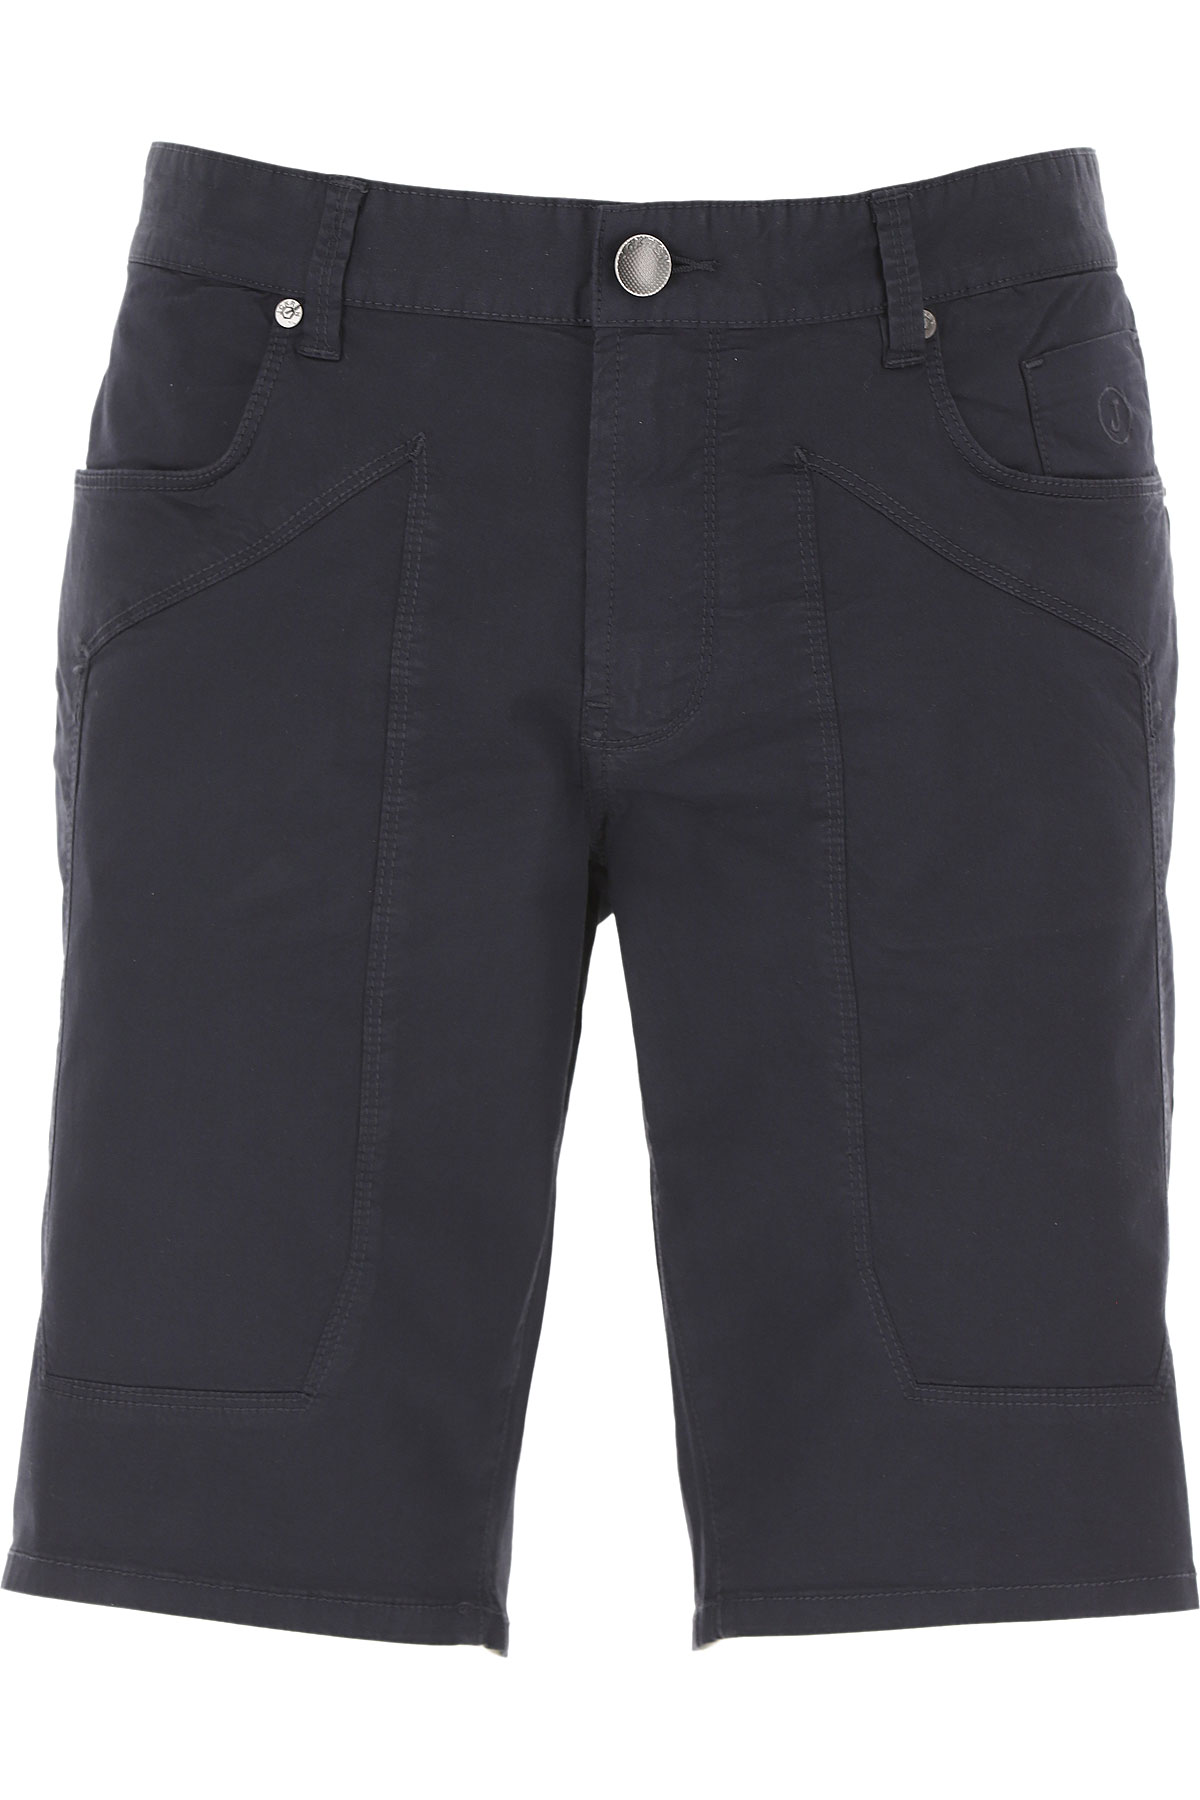 Jeckerson Shorts for Men On Sale, Navy Blue, Cotton, 2019, 30 31 32 33 34 36